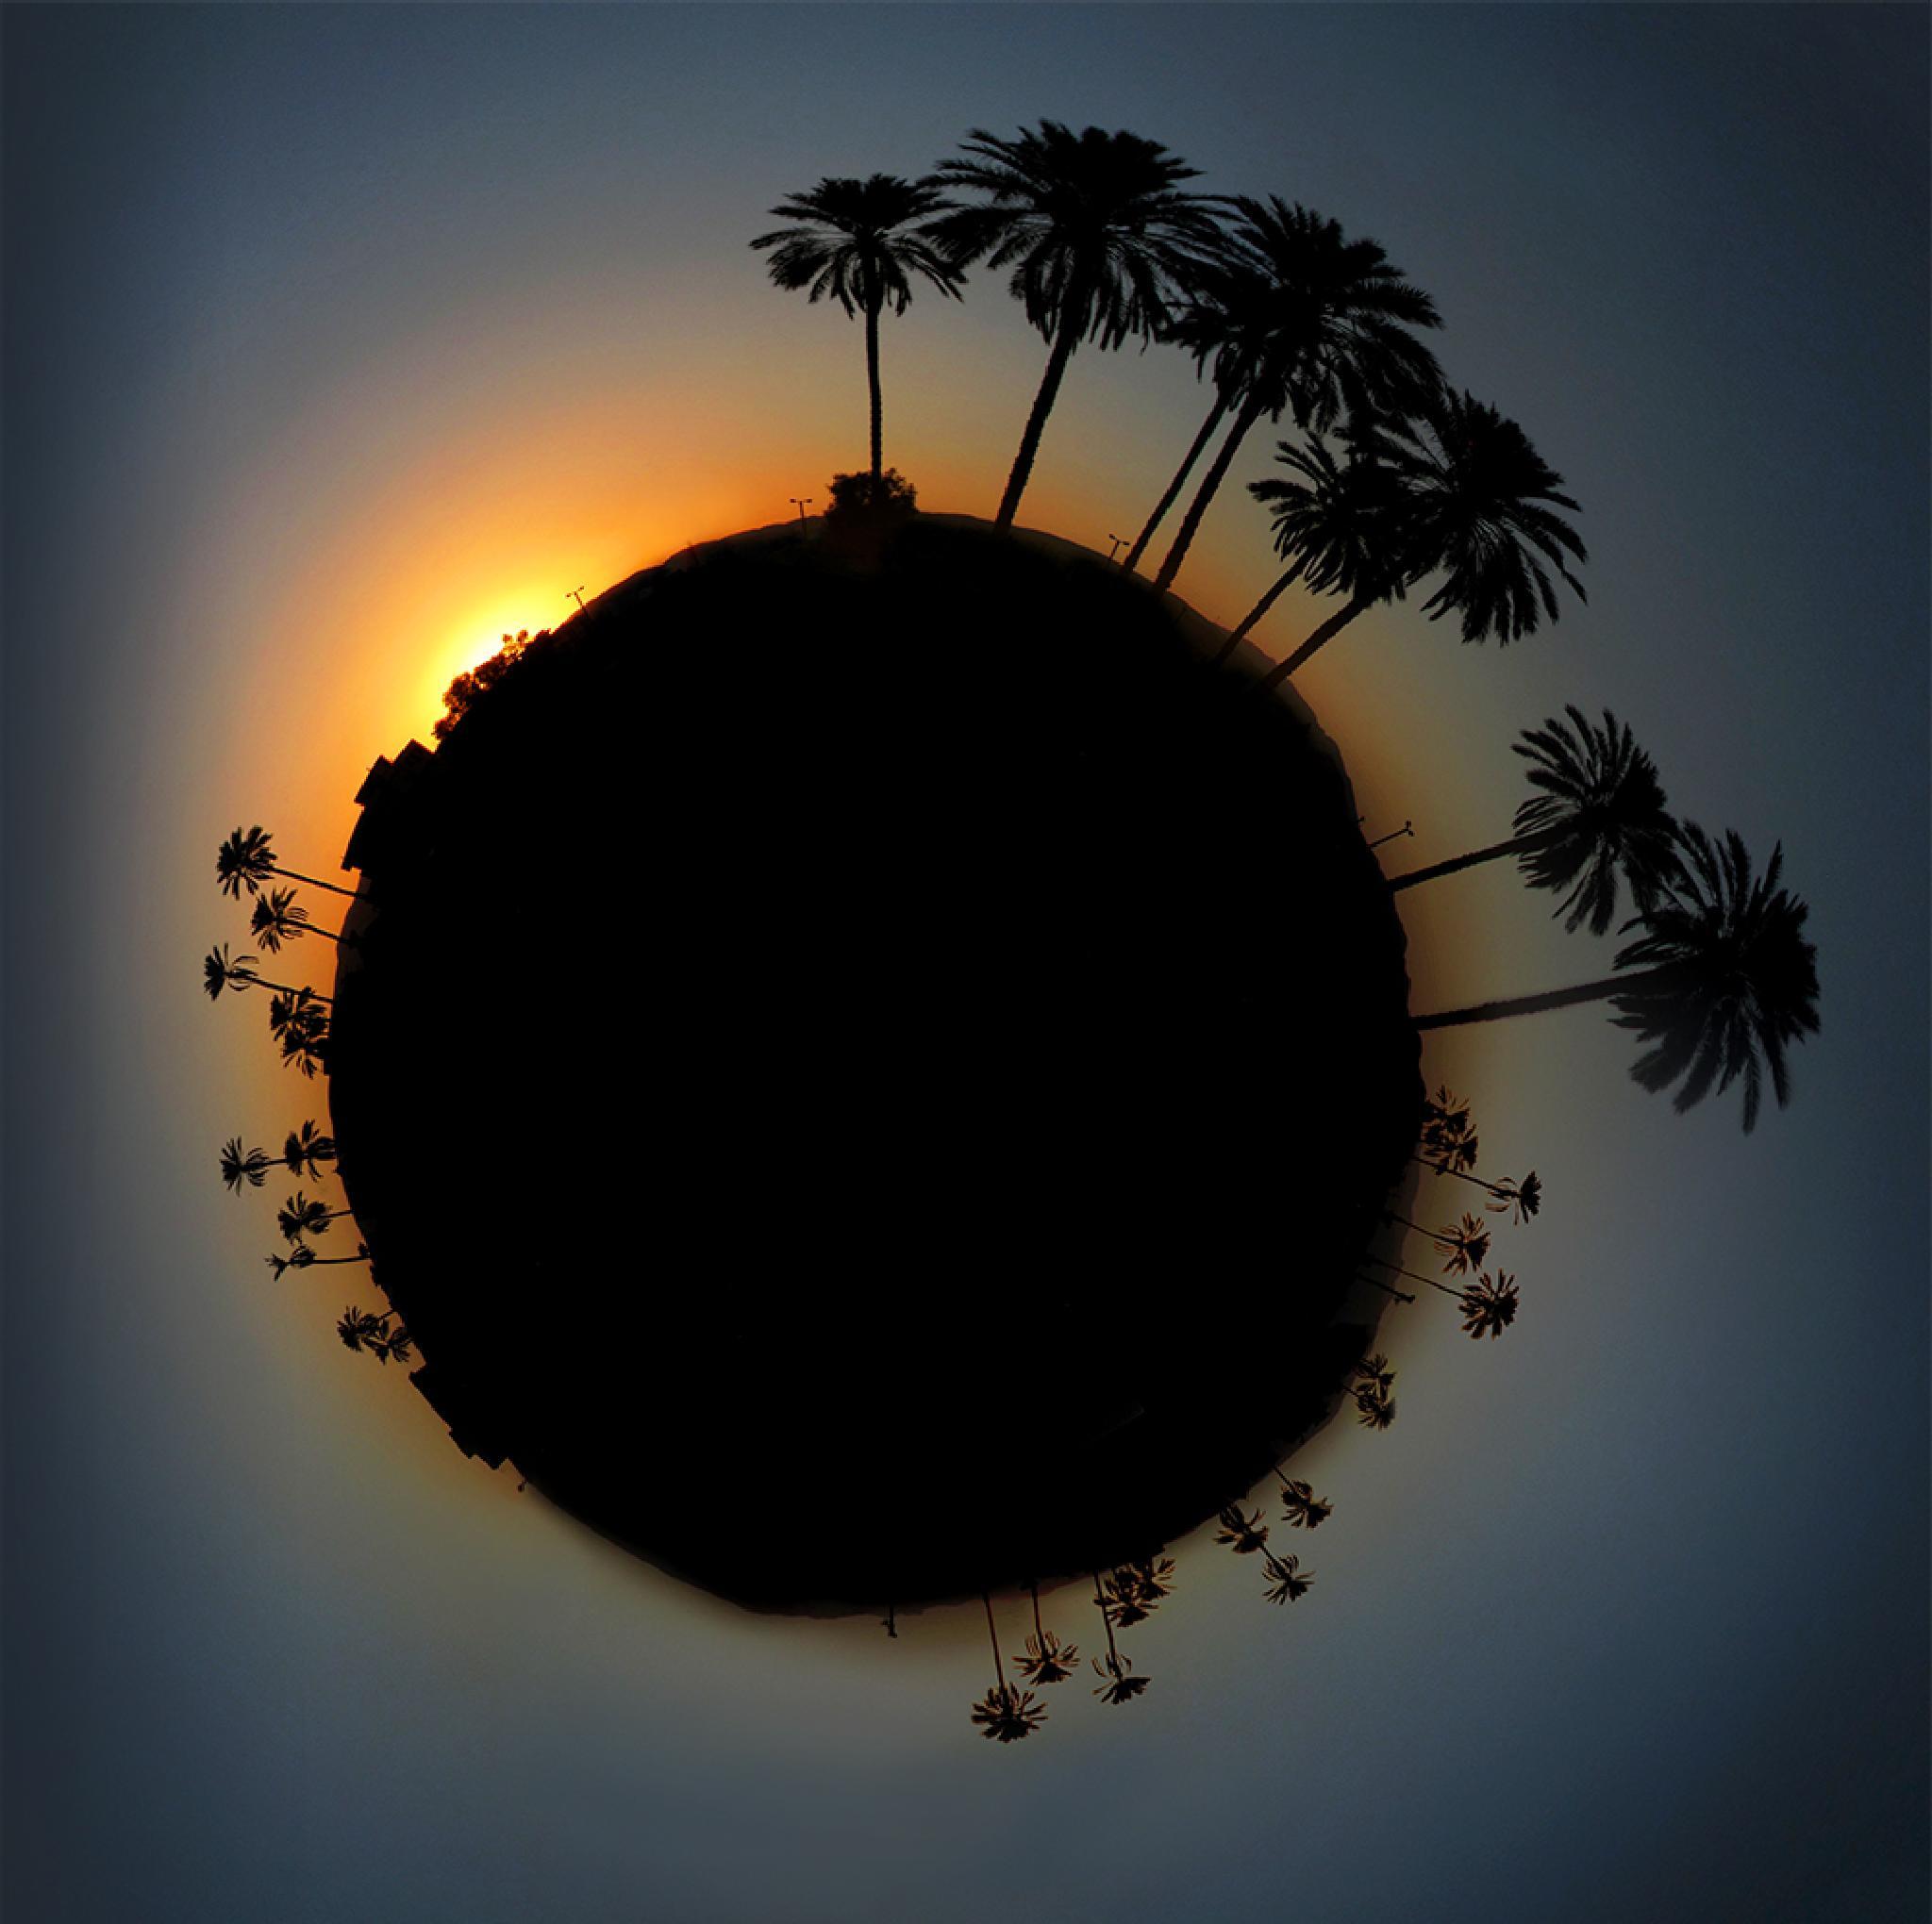 aloanely planet by Milad Eslamzadeh